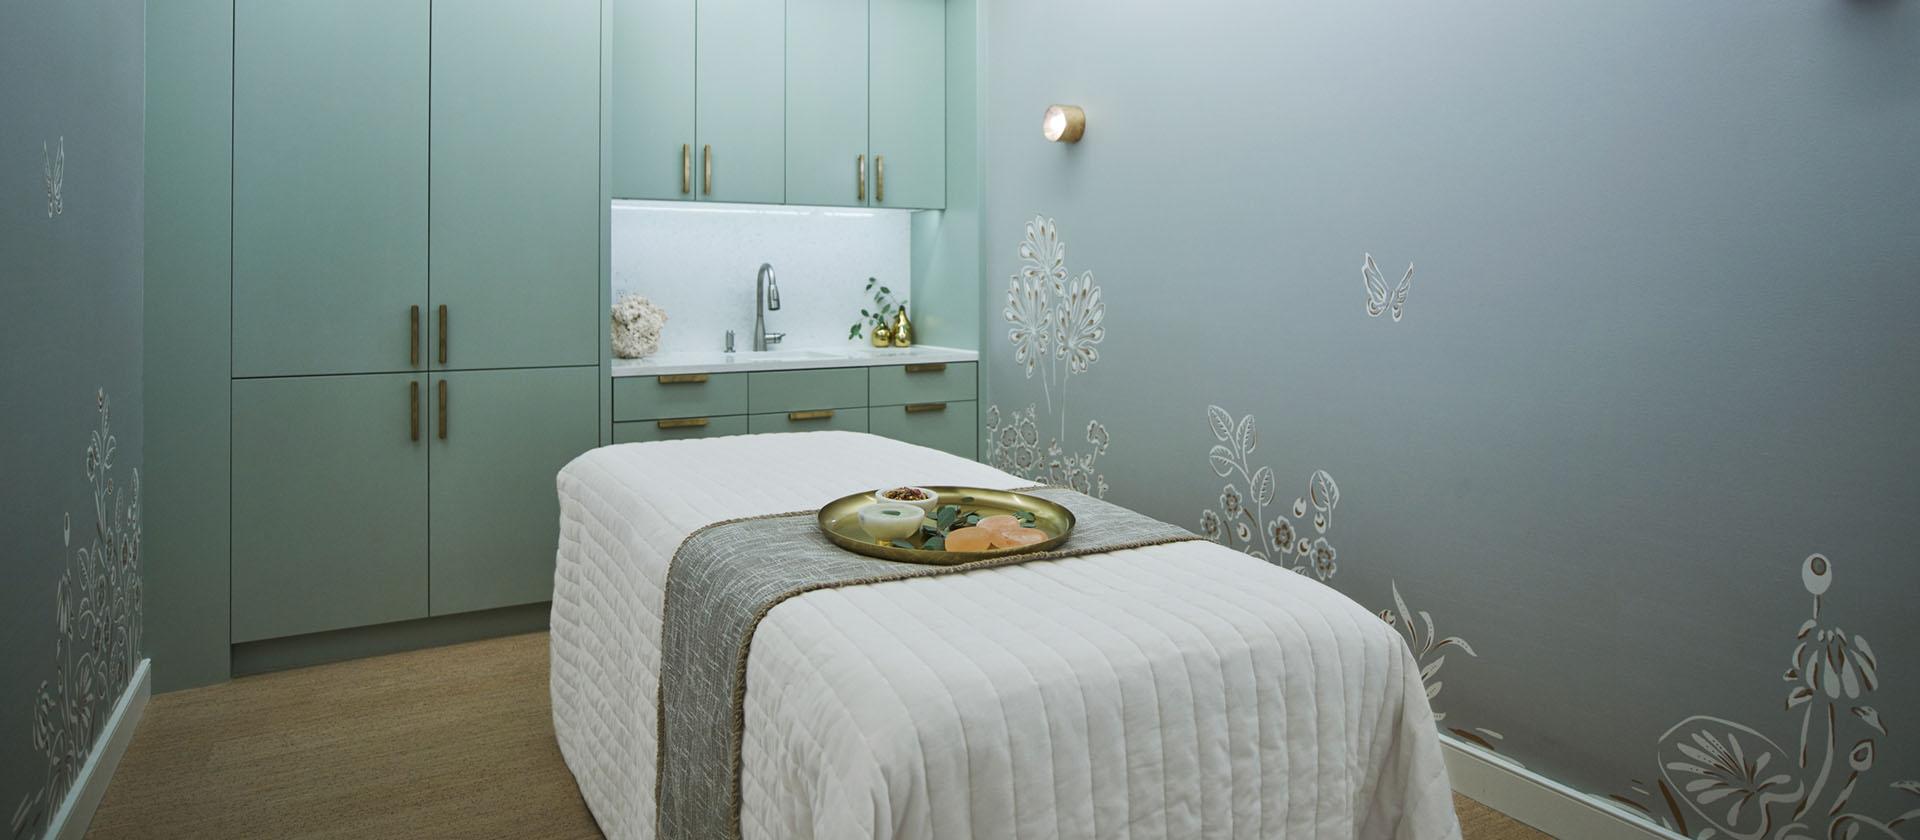 Serene treatment room set up with custom blue wallpaper